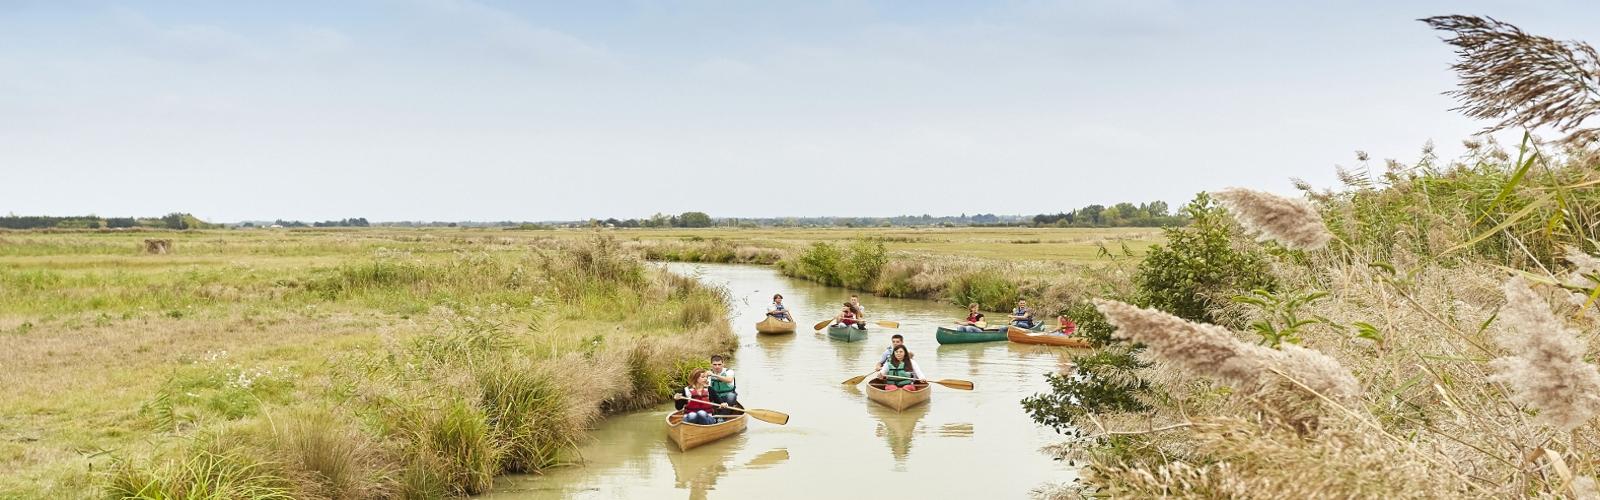 canoe vendee marais